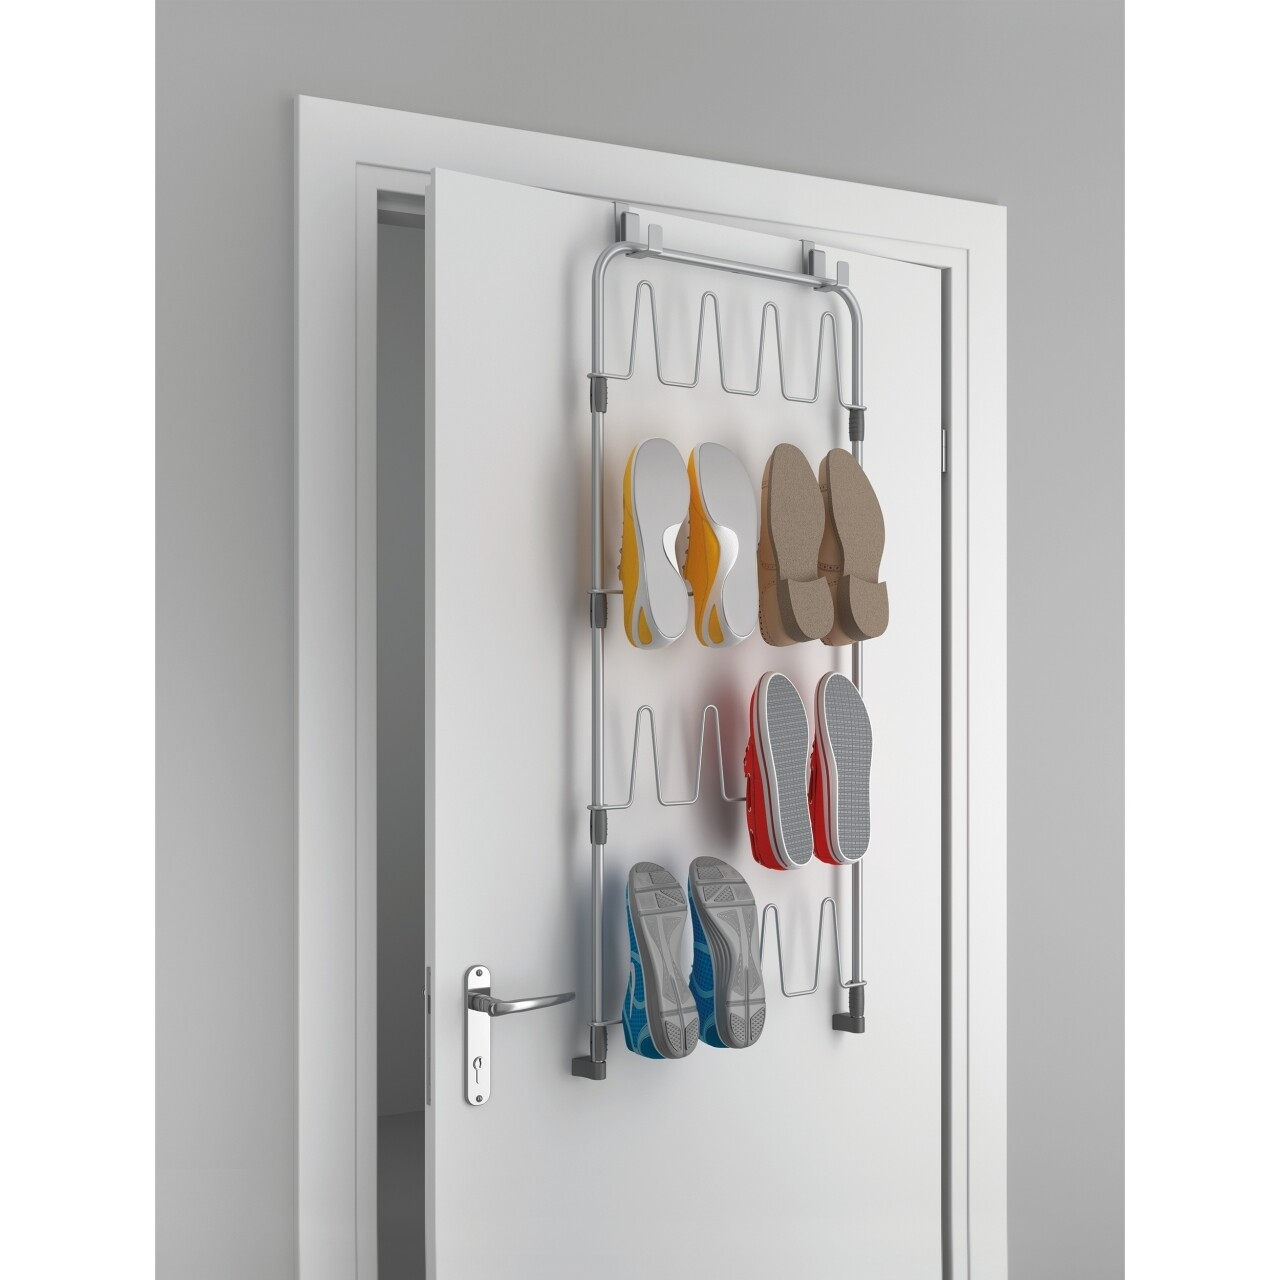 Suport suspendabil pentru depozitarea pantofilor Metaltex, 45x5x103 cm, metal/invelis plastic, argintiu